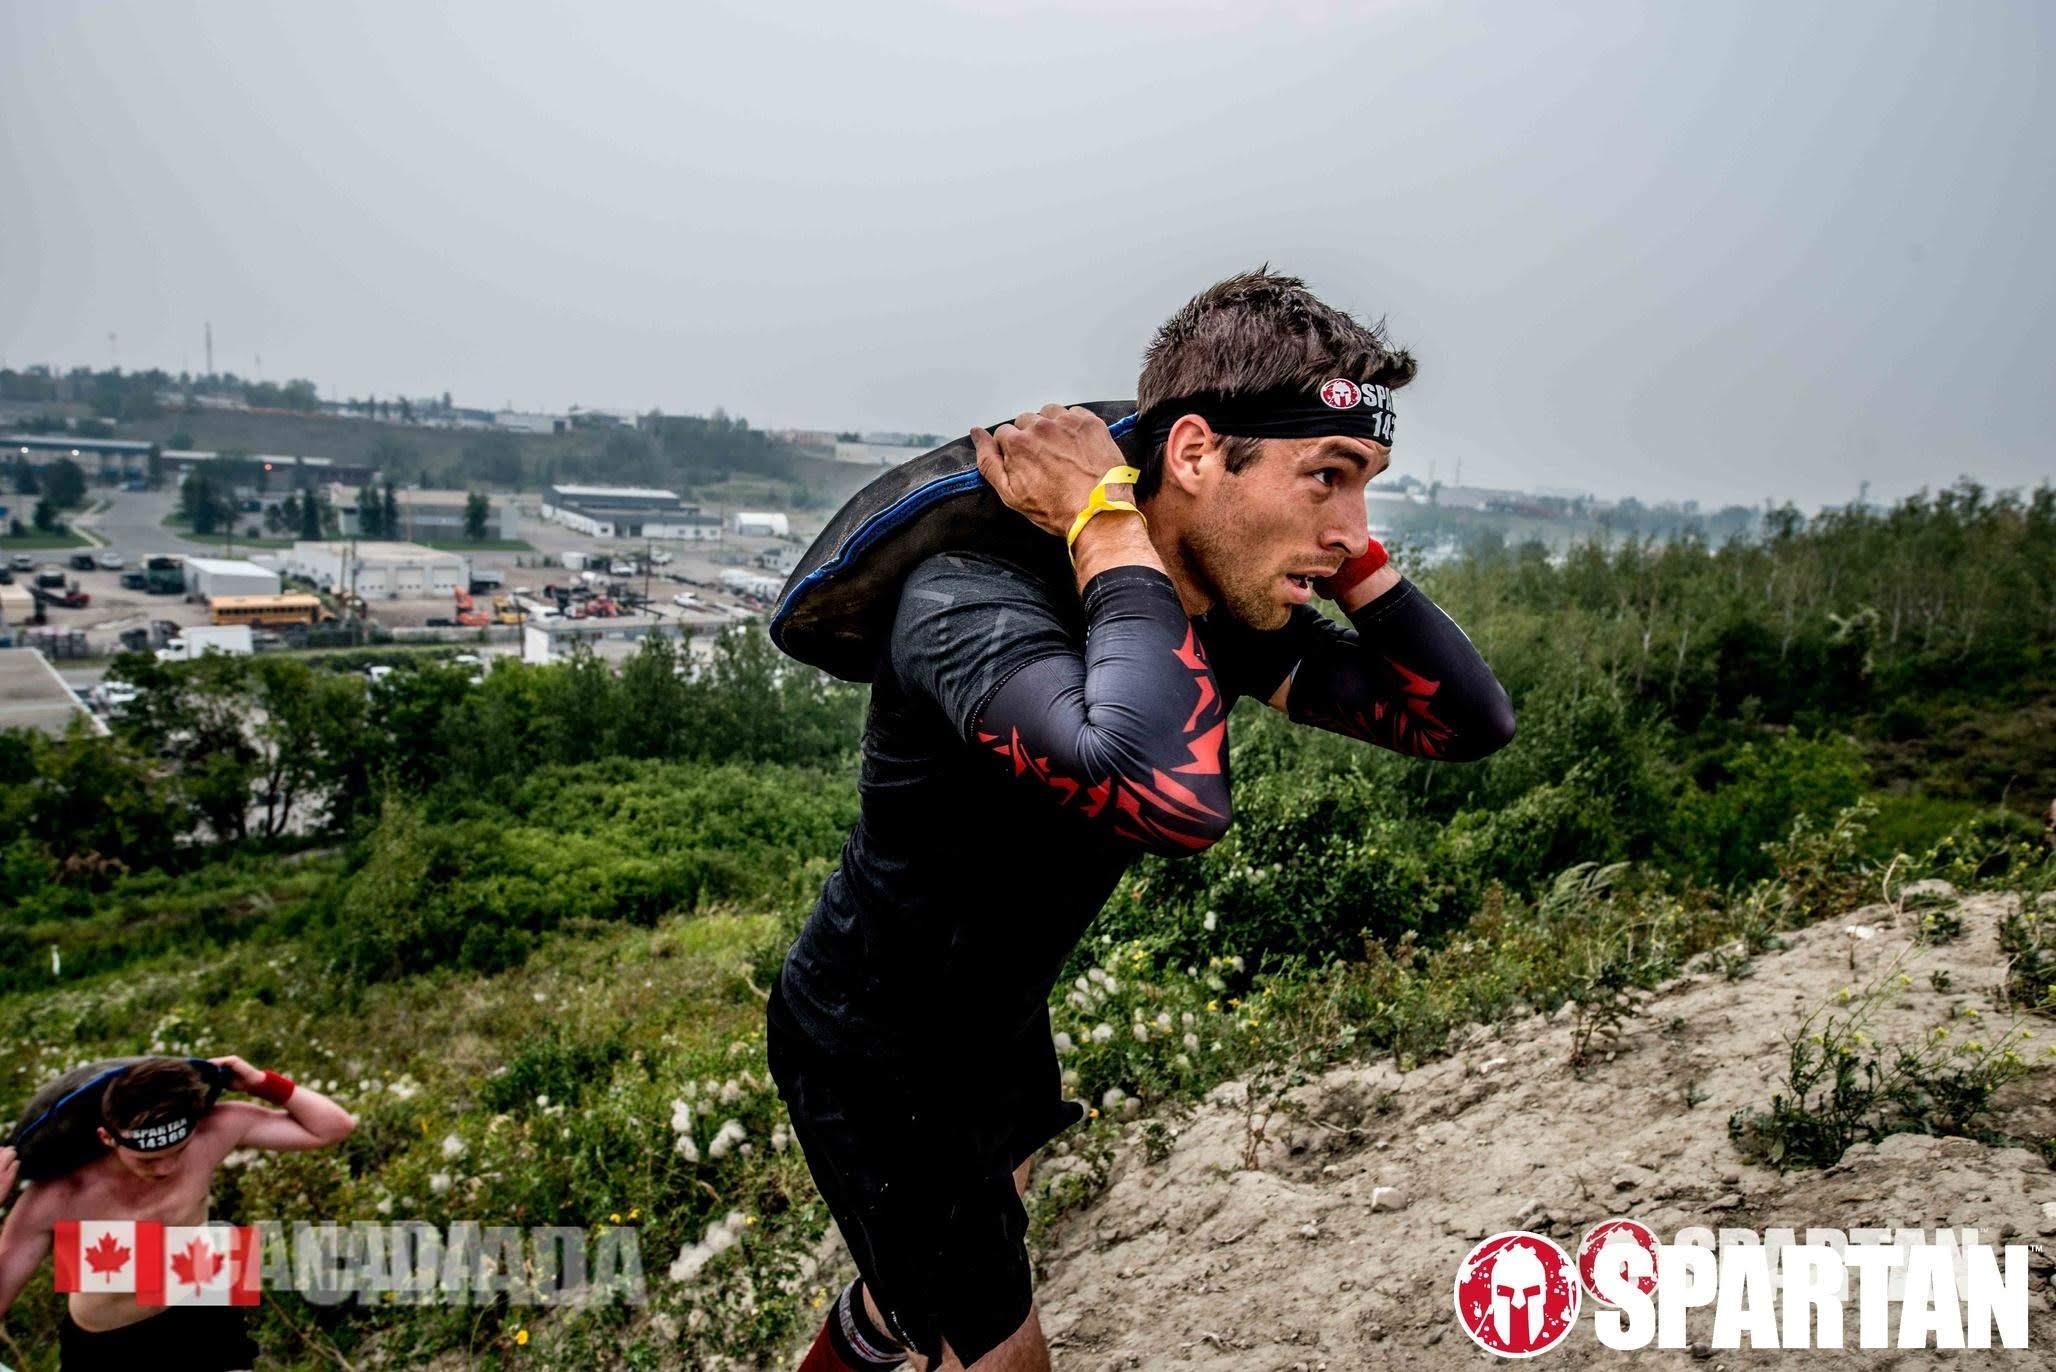 Calgary Spartan Race 2018 (1)